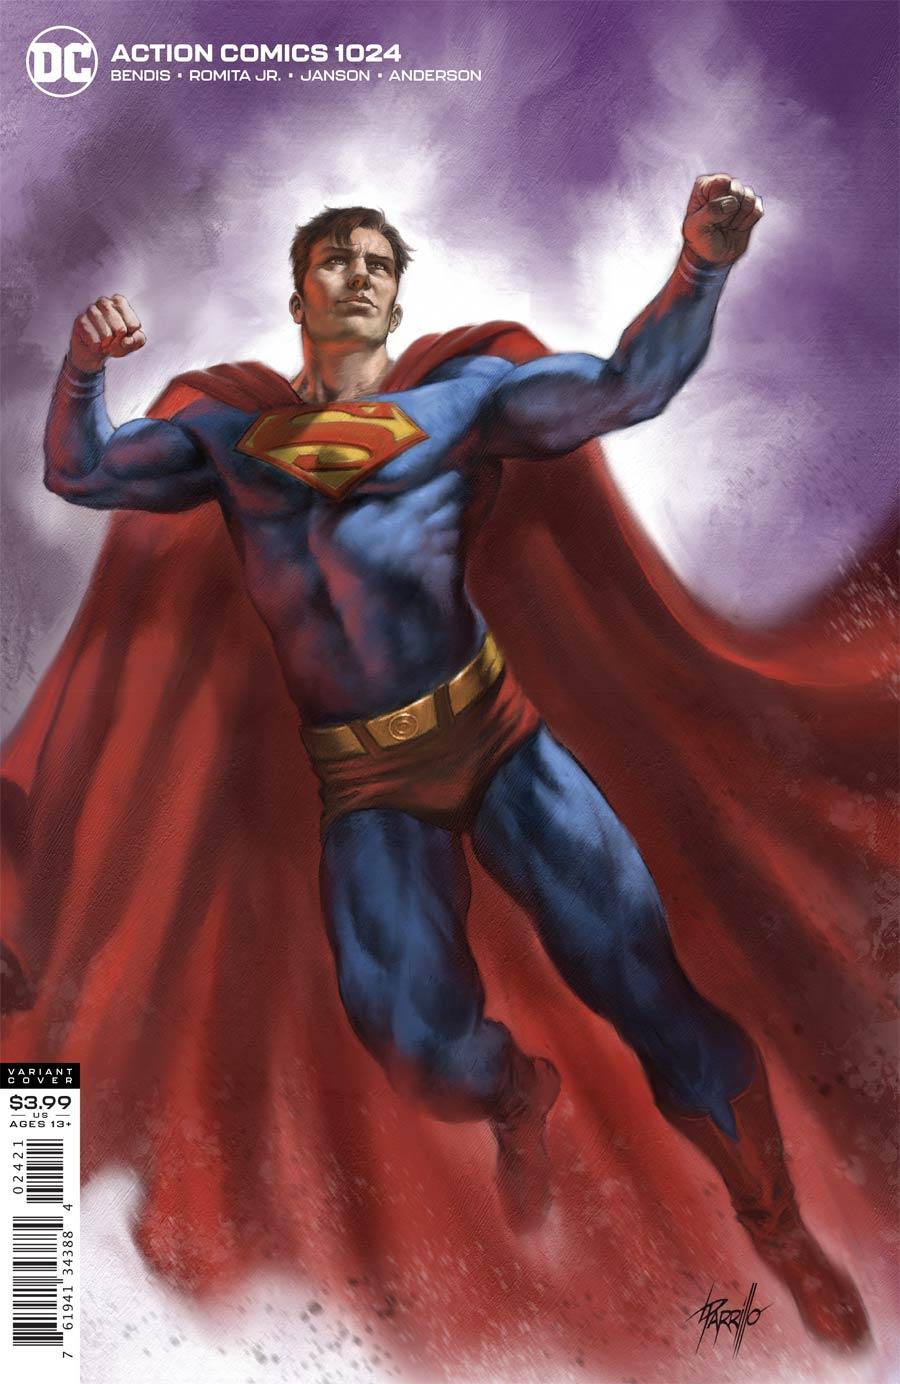 Action Comics Vol 2 #1024 Cover B Variant Lucio Parrillo Cover